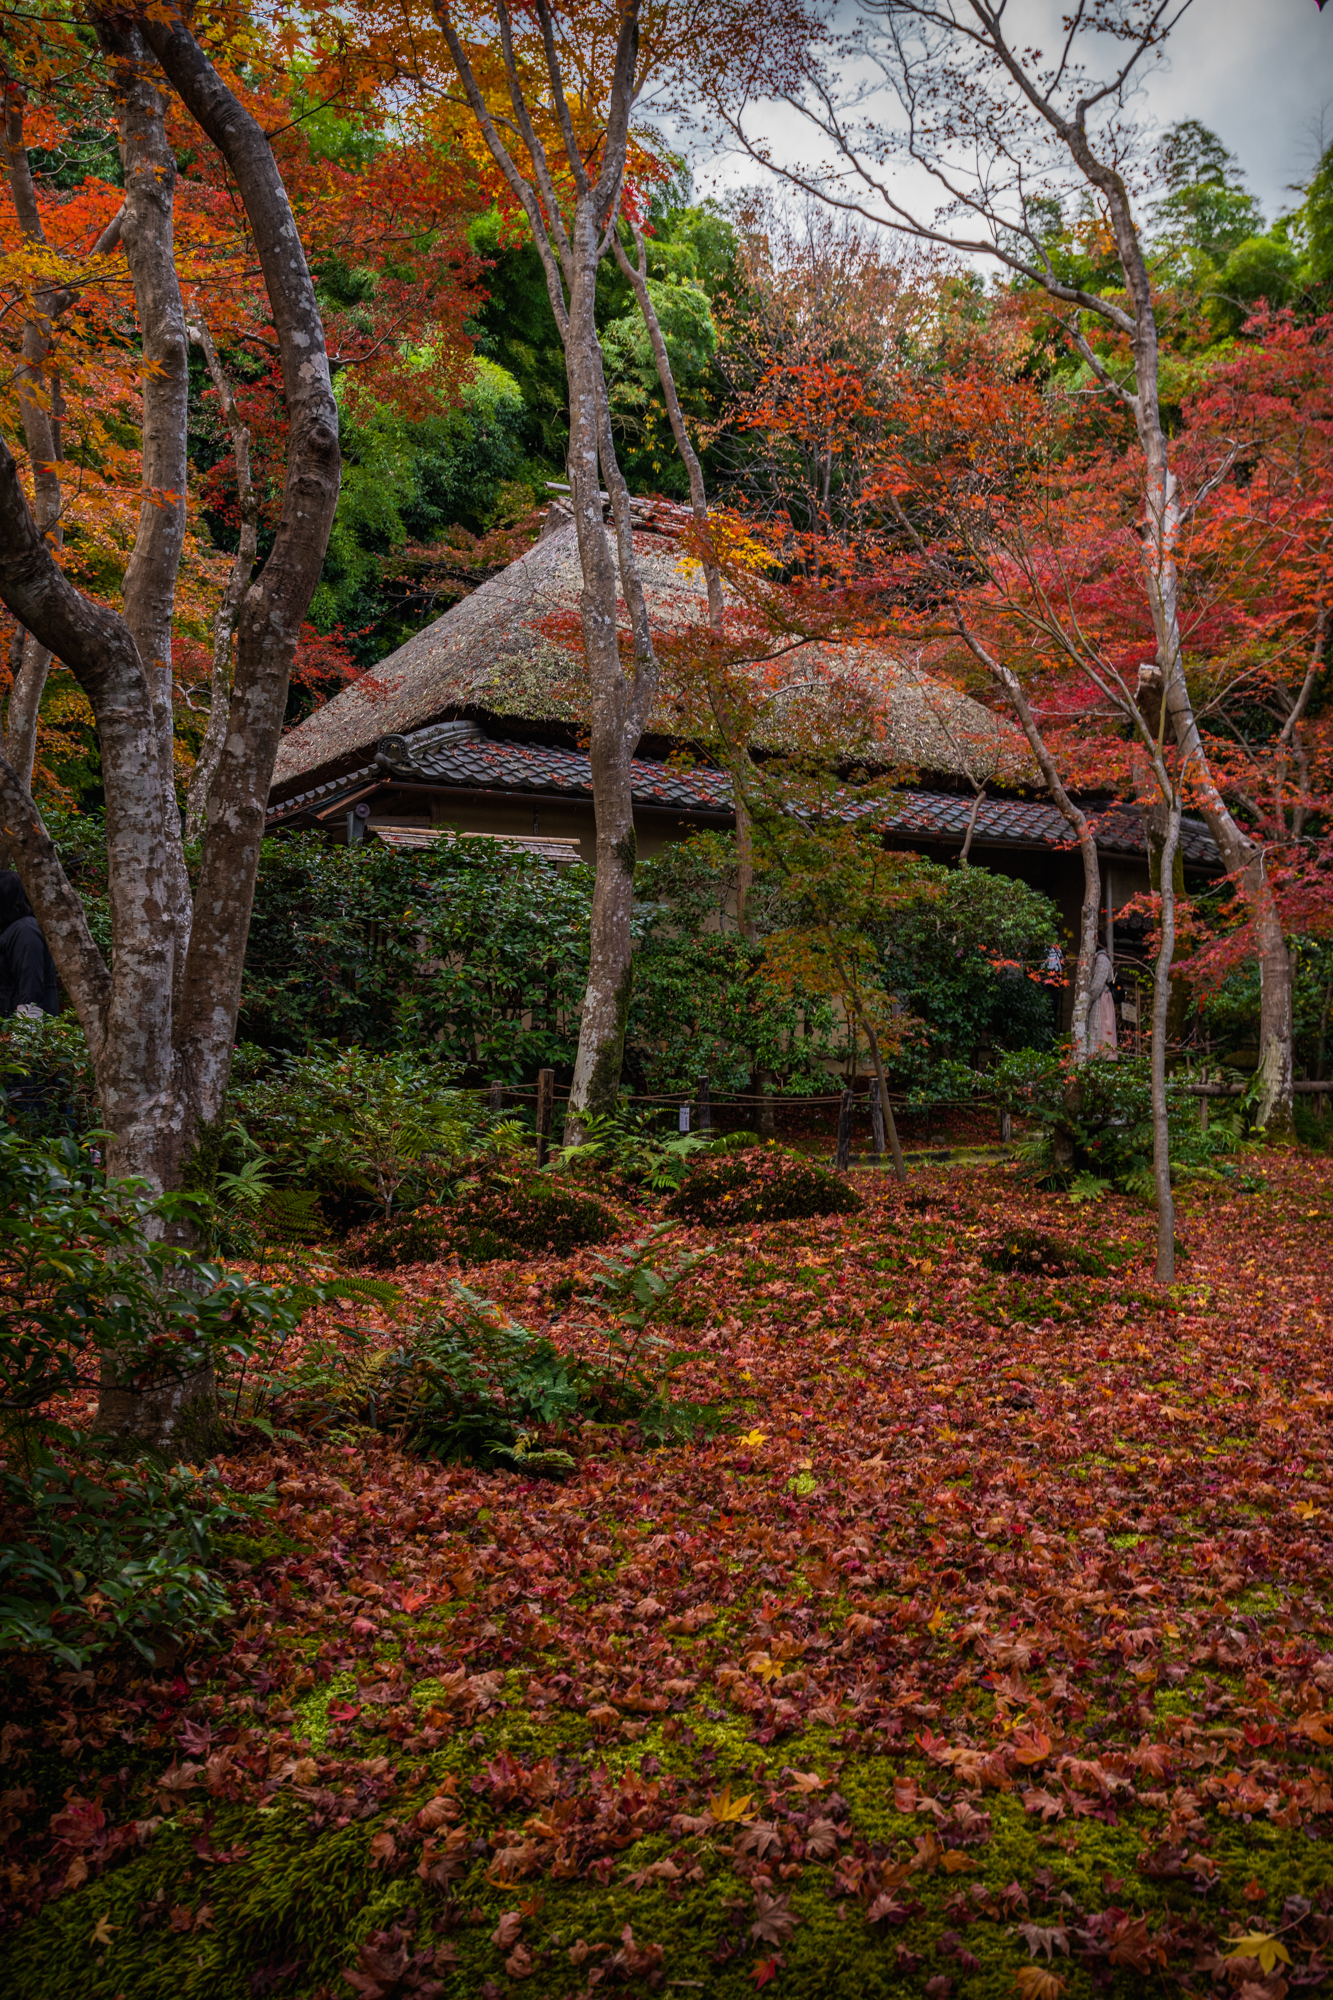 NIKON-CORPORATION_NIKON-D850_3254585714-3254697015_22050 京都  祇王寺  Kyoto Gioji temple(苔の庭が紅葉の絨毯に染まるおすすめの写真スポット!撮影した写真の紹介、アクセス情報や交通手段など!)